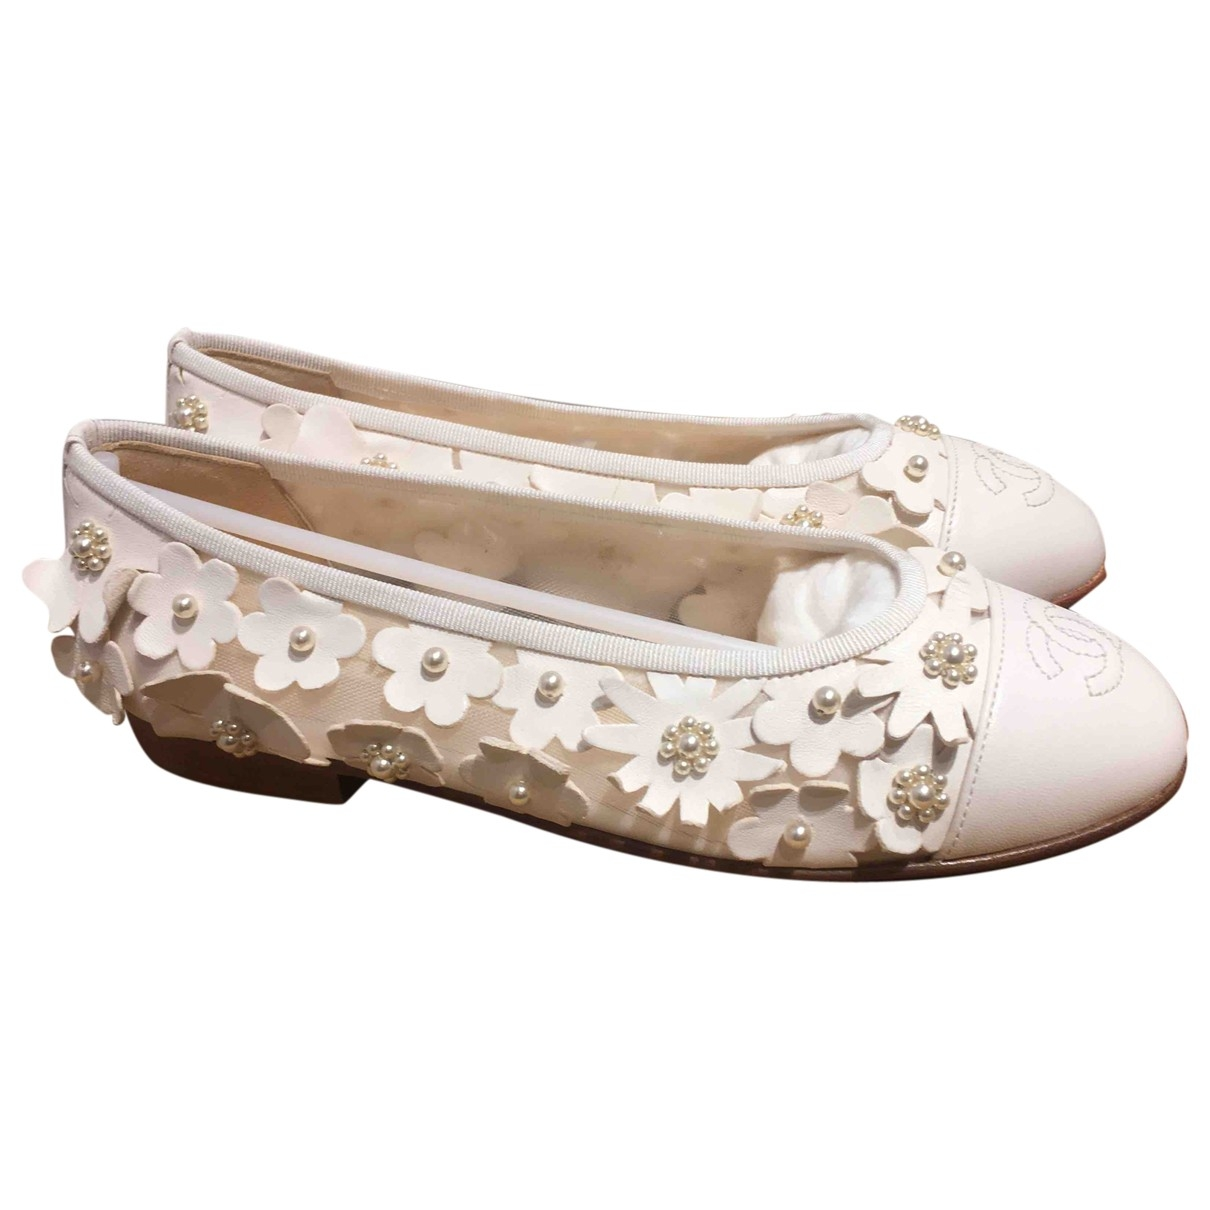 Chanel \N White Leather Ballet flats for Women 35 EU